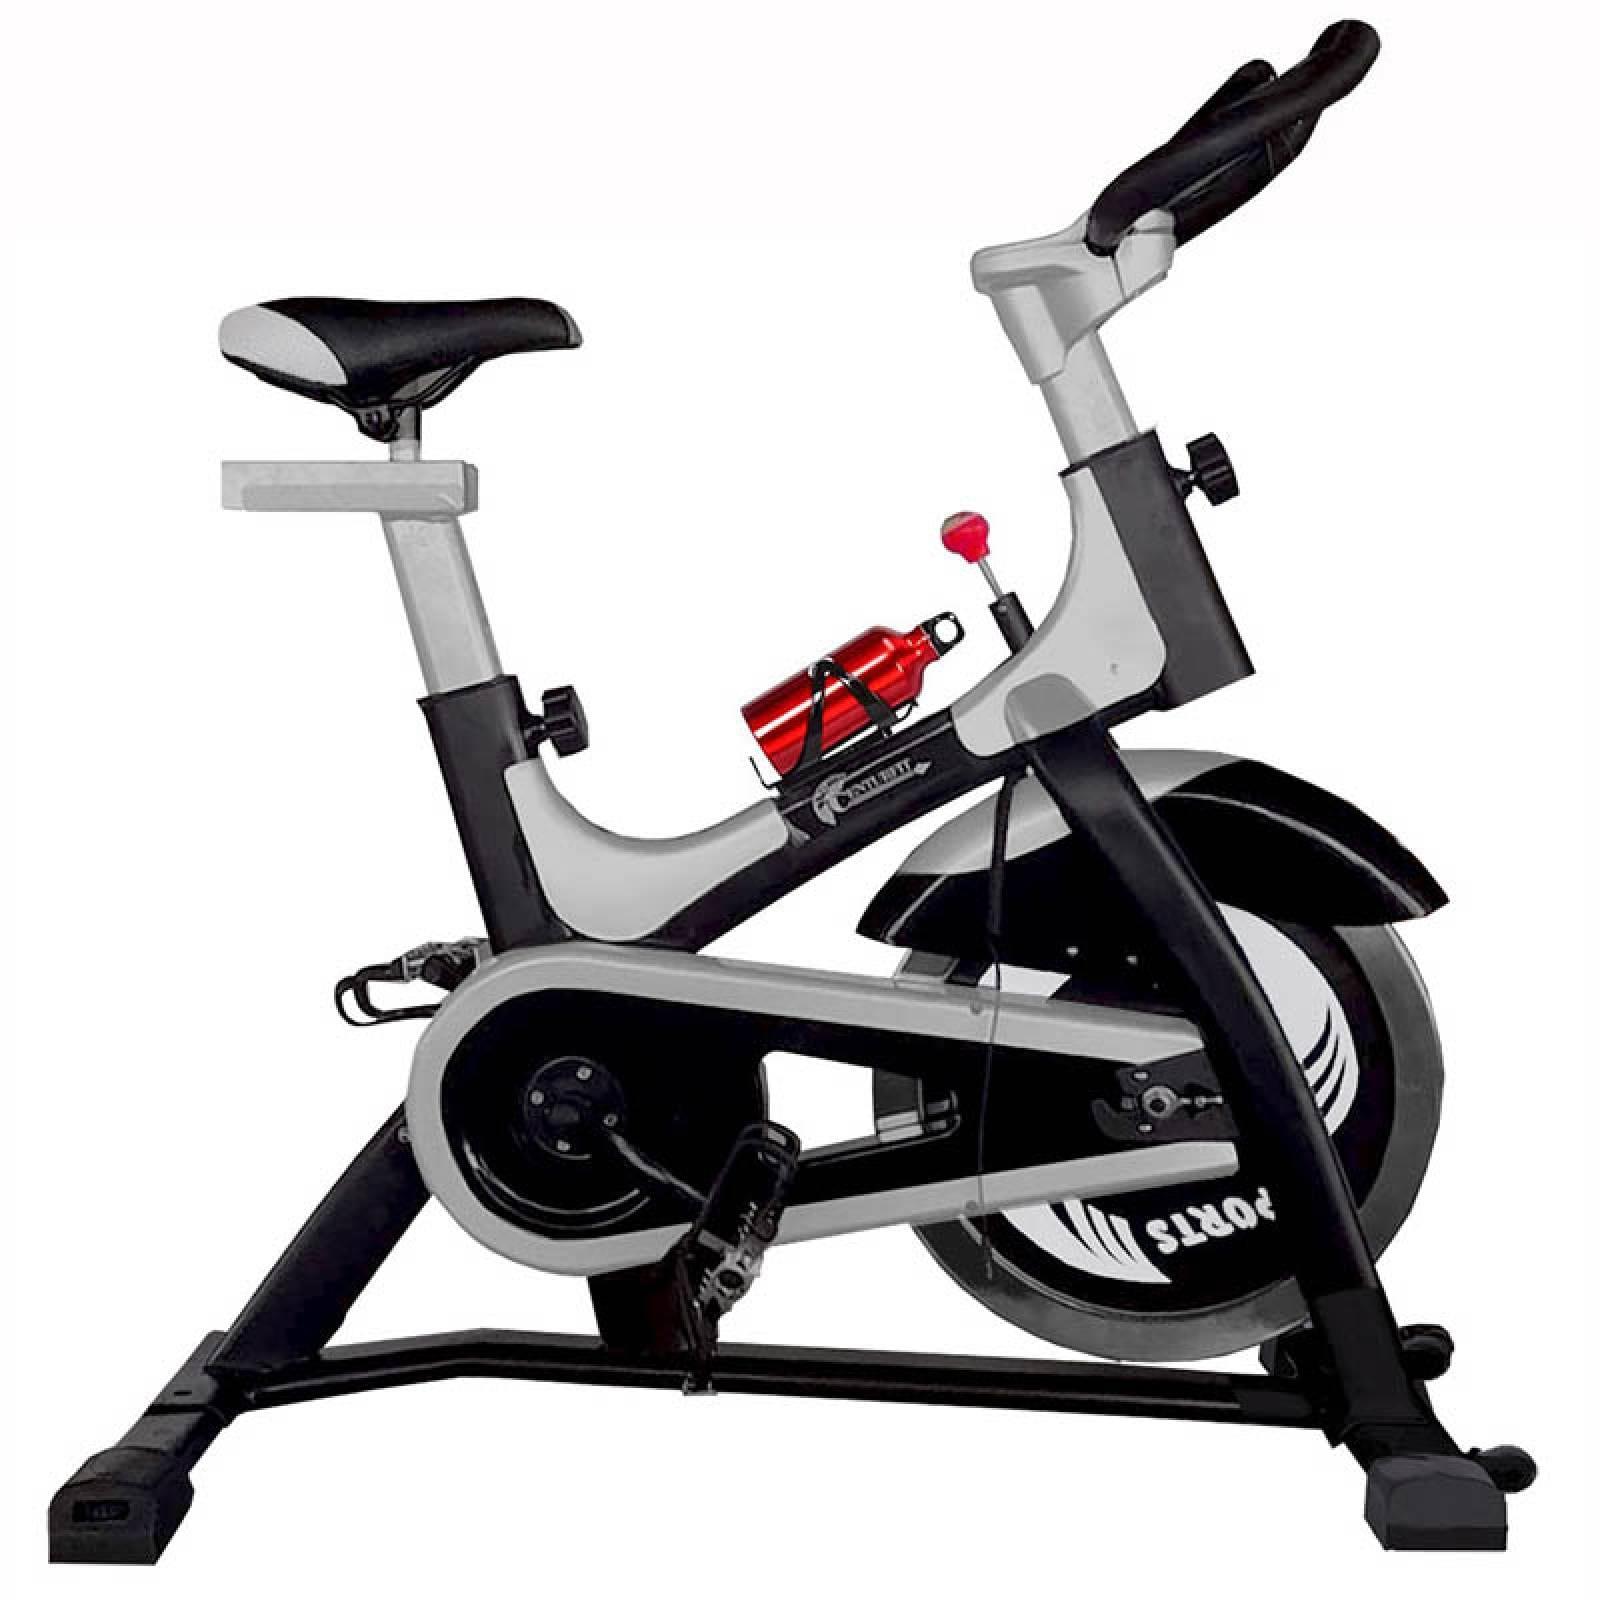 Bicicleta Spinning 18 Kg Centurfit Ejercicio Gym Fija